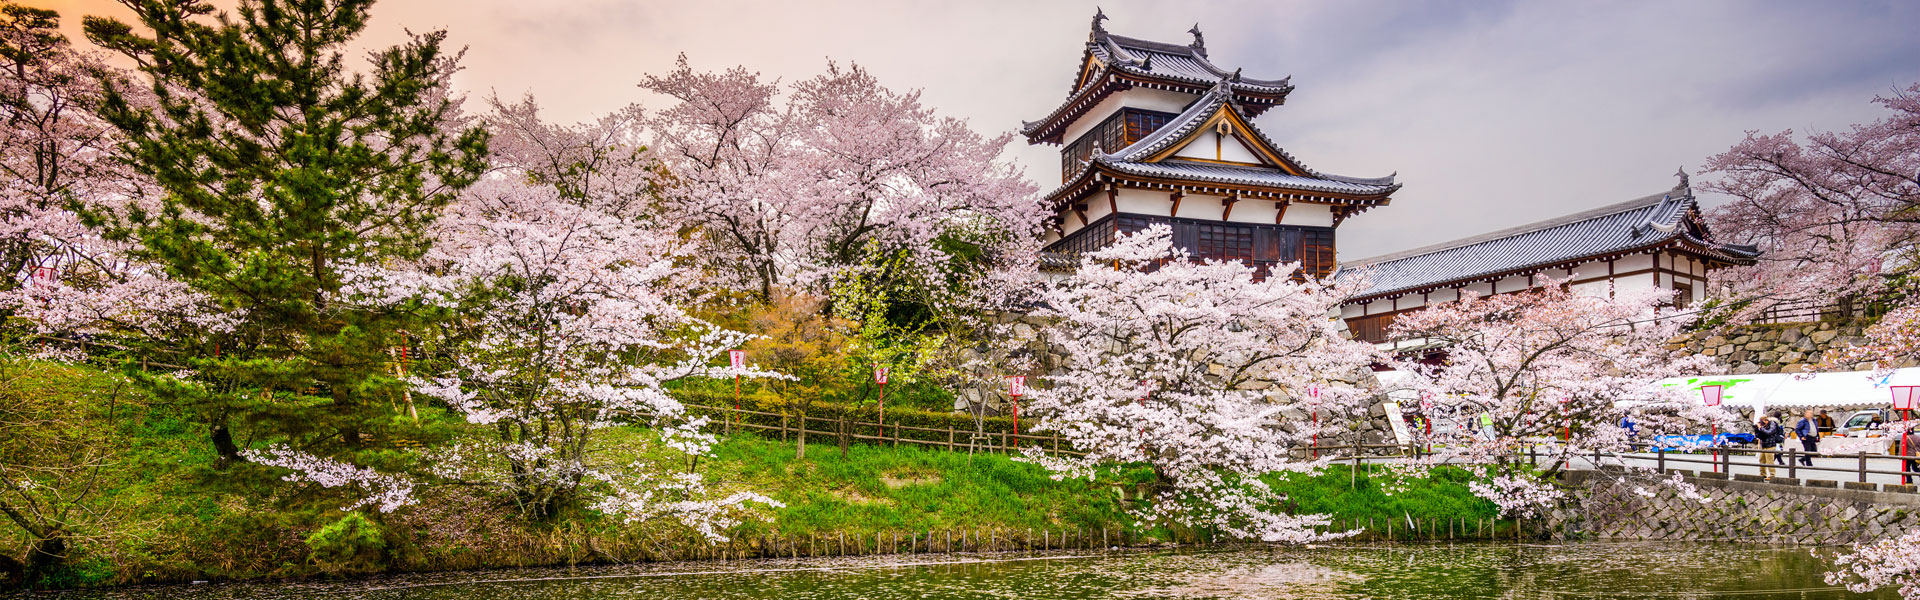 japanese-castle-sakura